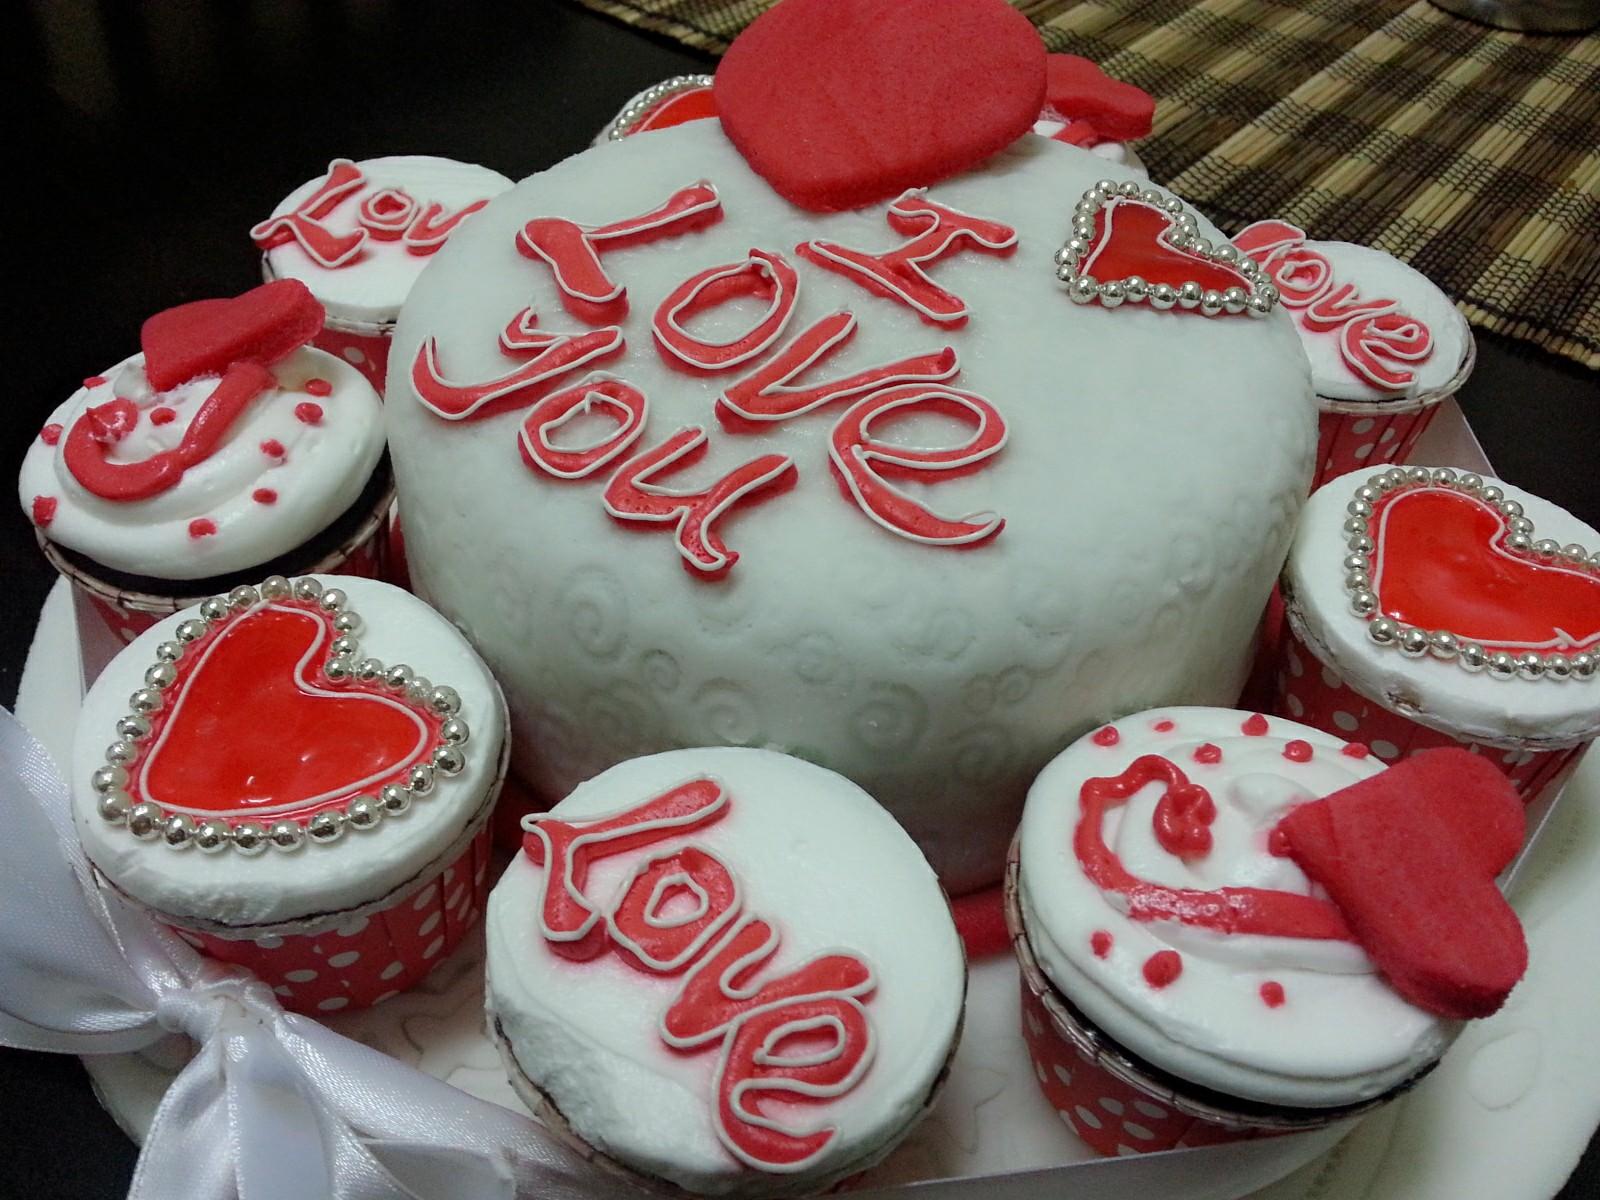 i love cakes 😍